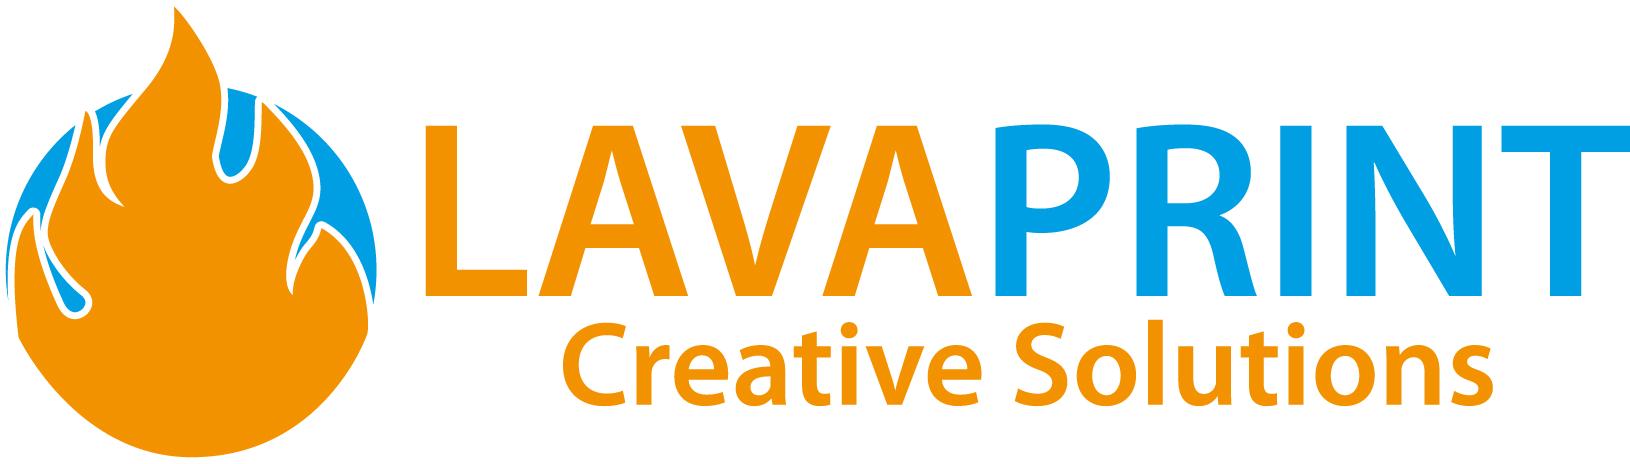 Lavaprint – Webshop